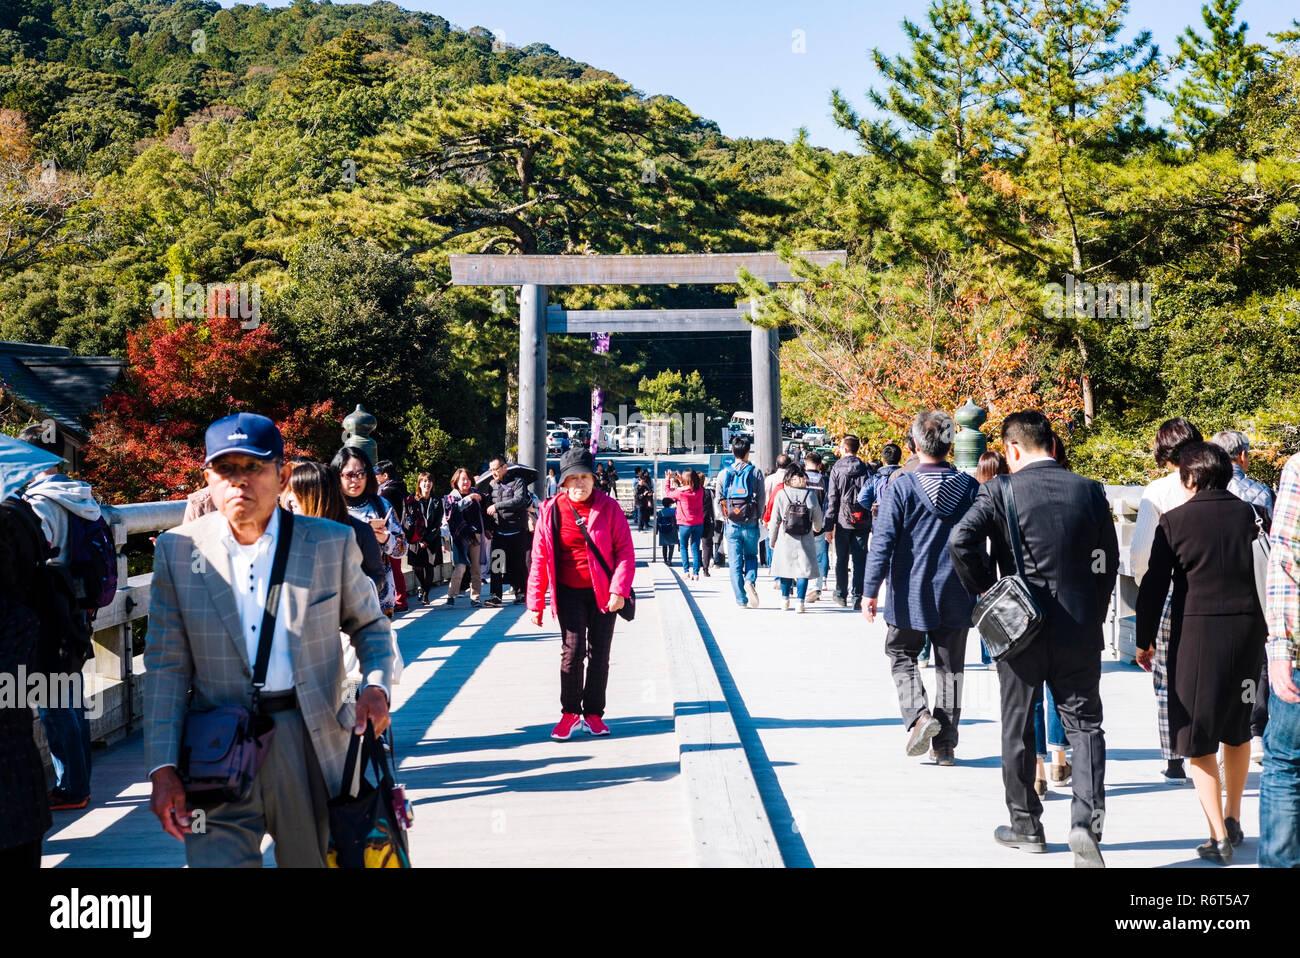 Ise Grand Shrine, Mie Prefecture, Japan: Pilgrims crossing Uji Bridge to enter the Inner Shrine (Naiku) - Stock Image